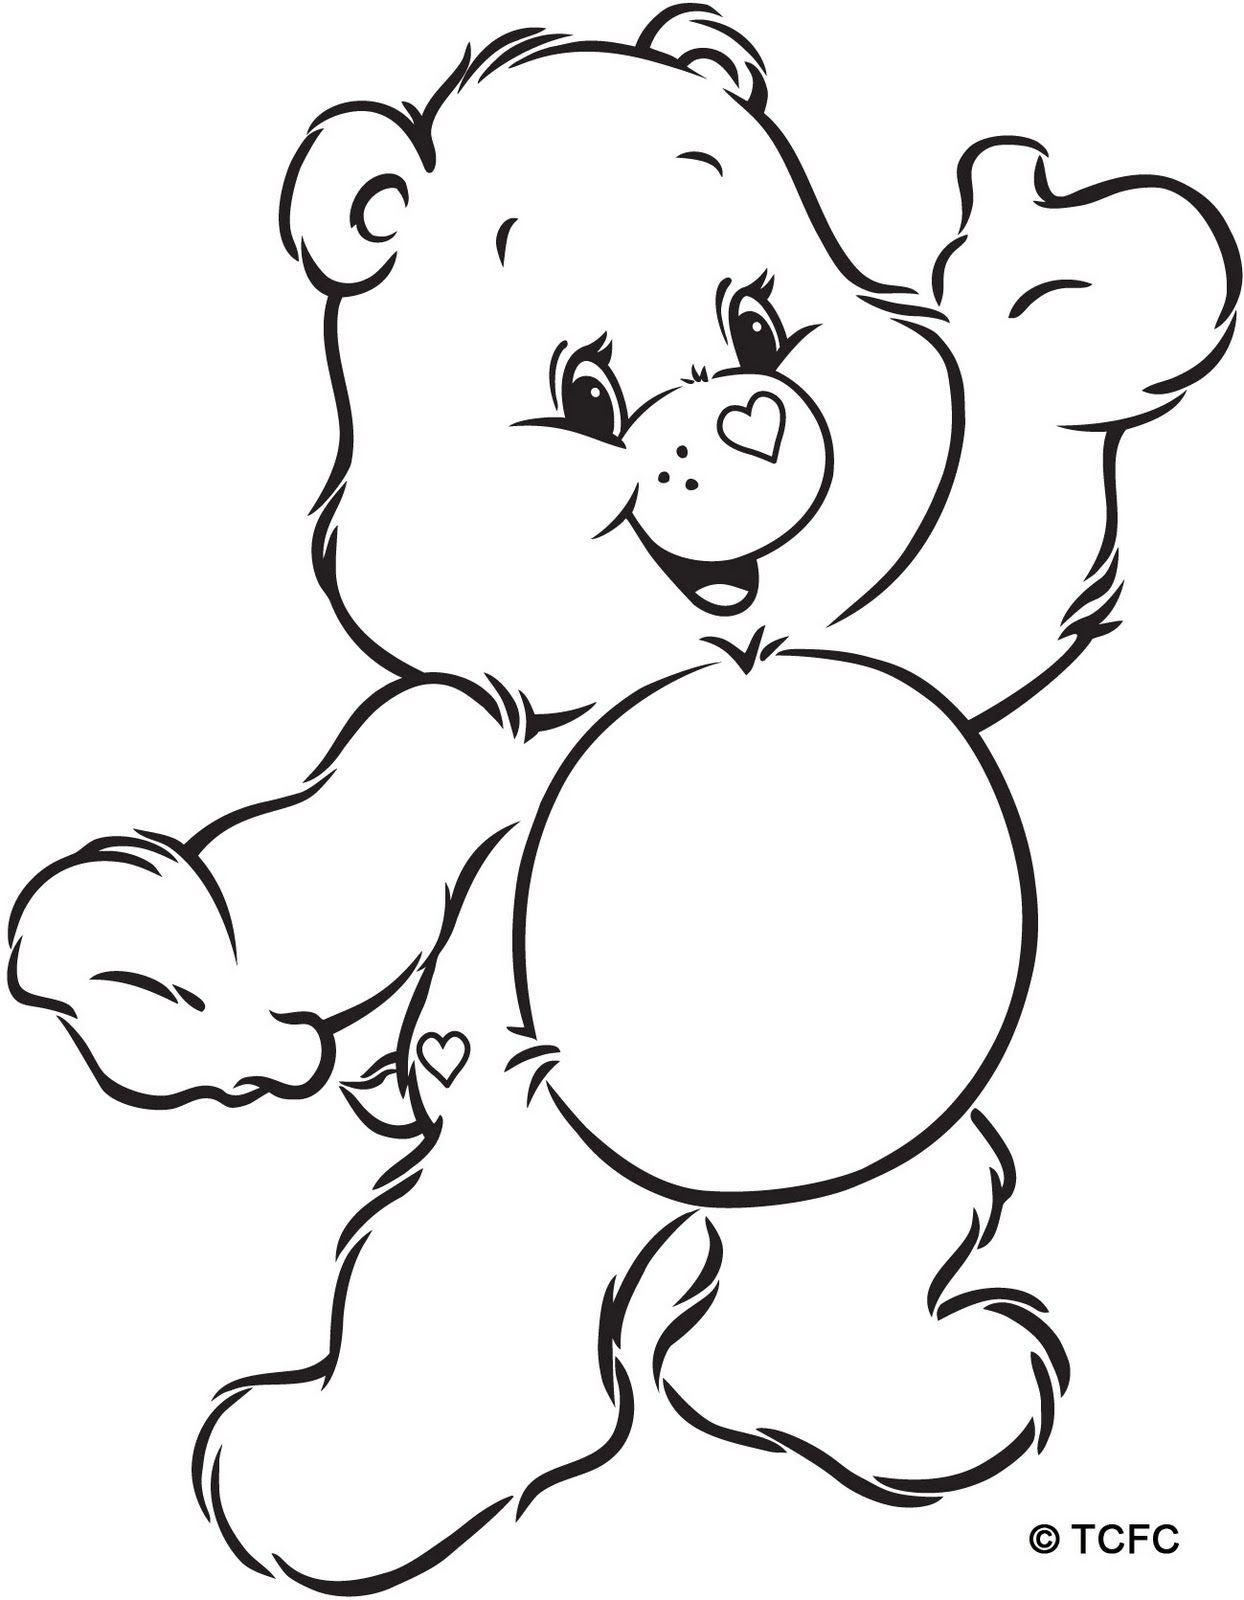 Design Your Own Care Bear (Mit Bildern) Care Bears